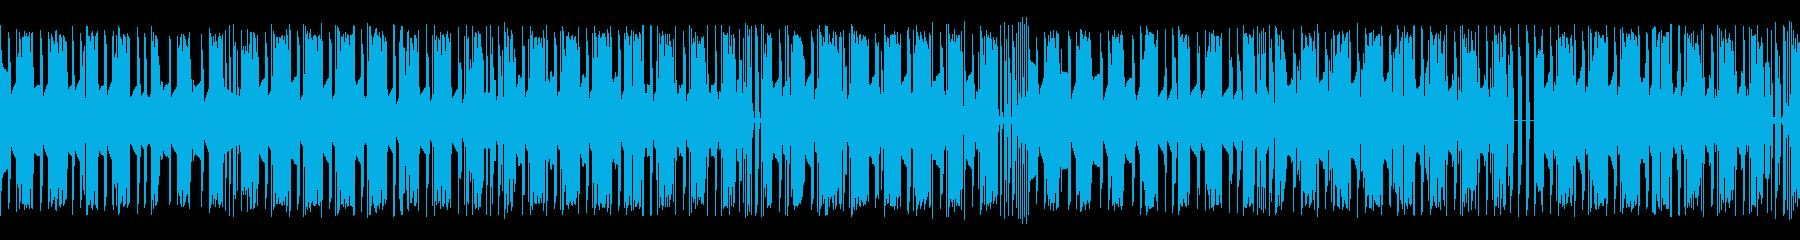 BGM008-03 エレピとアナログド…の再生済みの波形